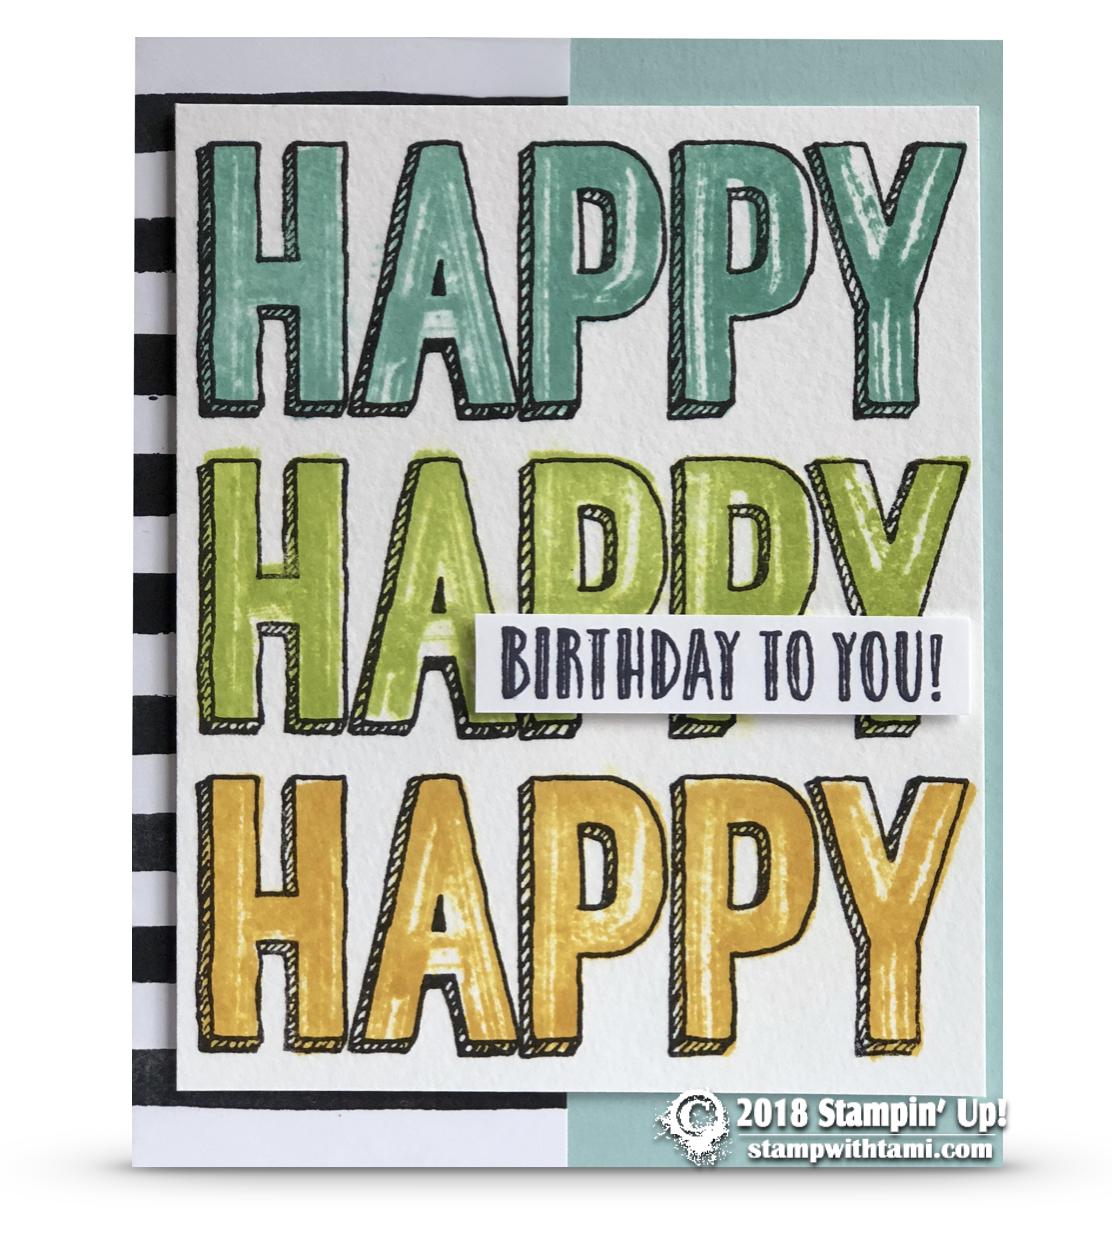 Retiring Happy Celebration Birthday Card Stampin Up Demonstrator